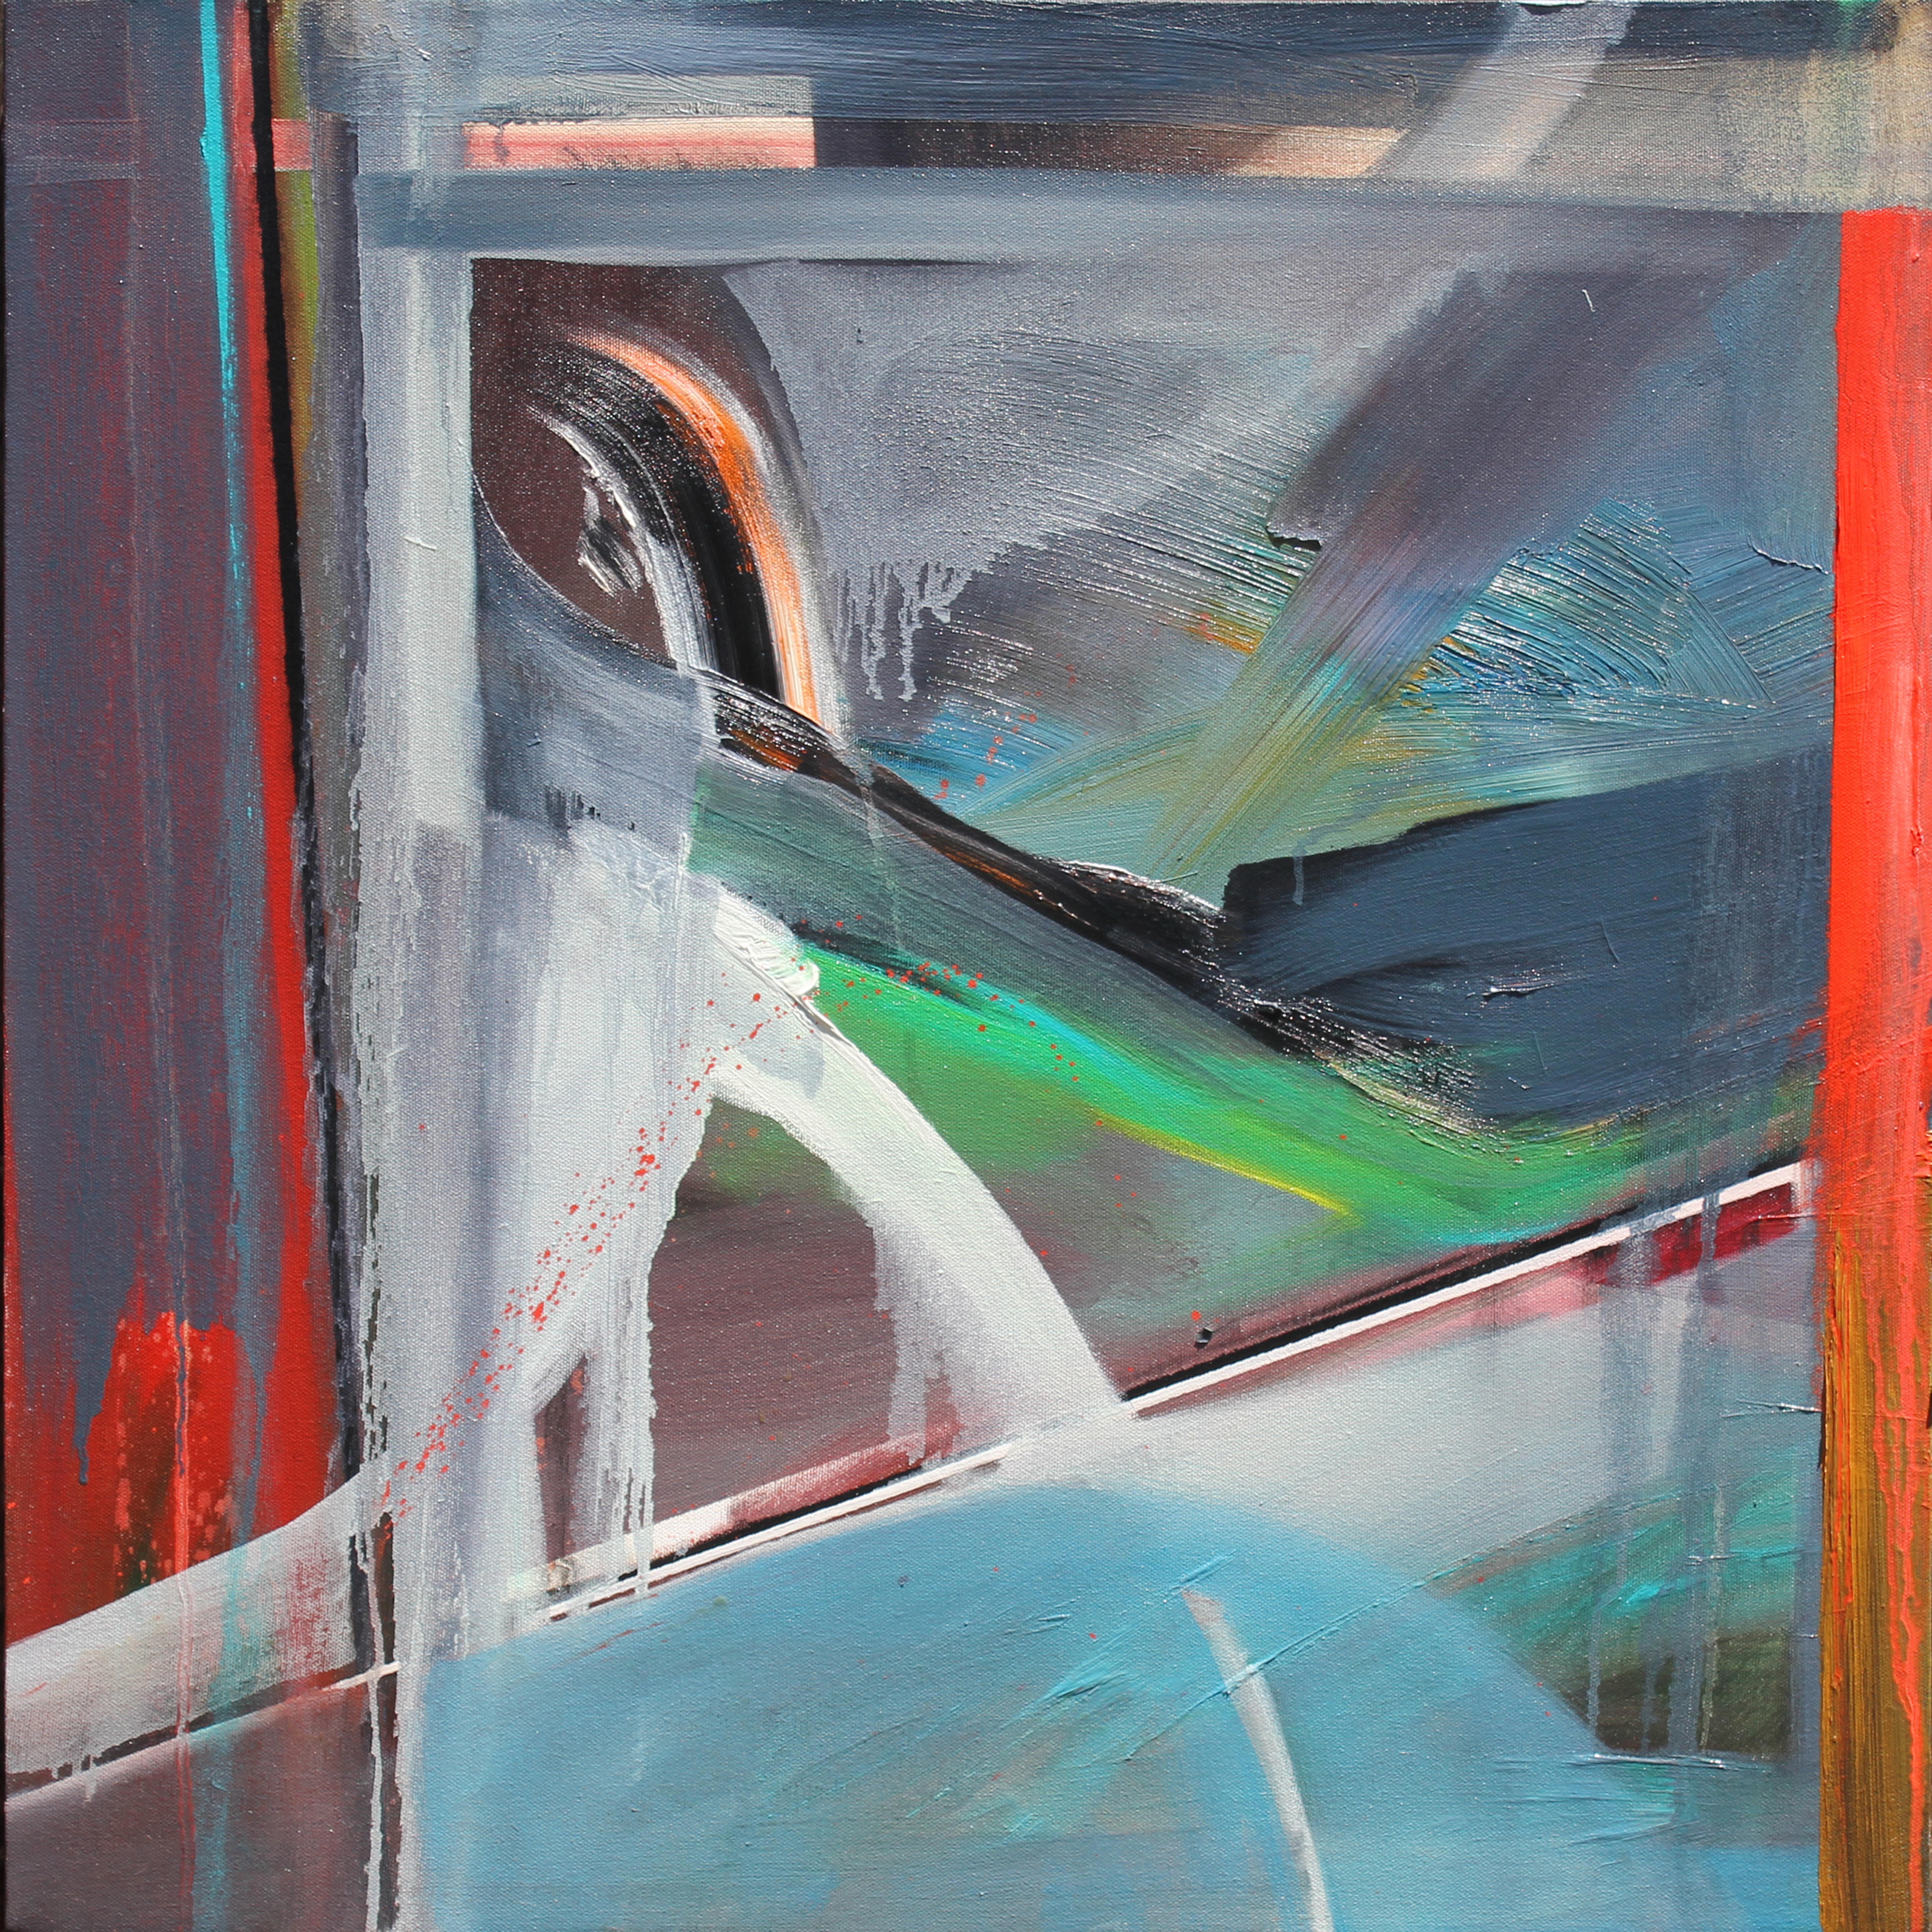 Method and Season No. 6 24x24 Oil on Canvas Phillip Potter